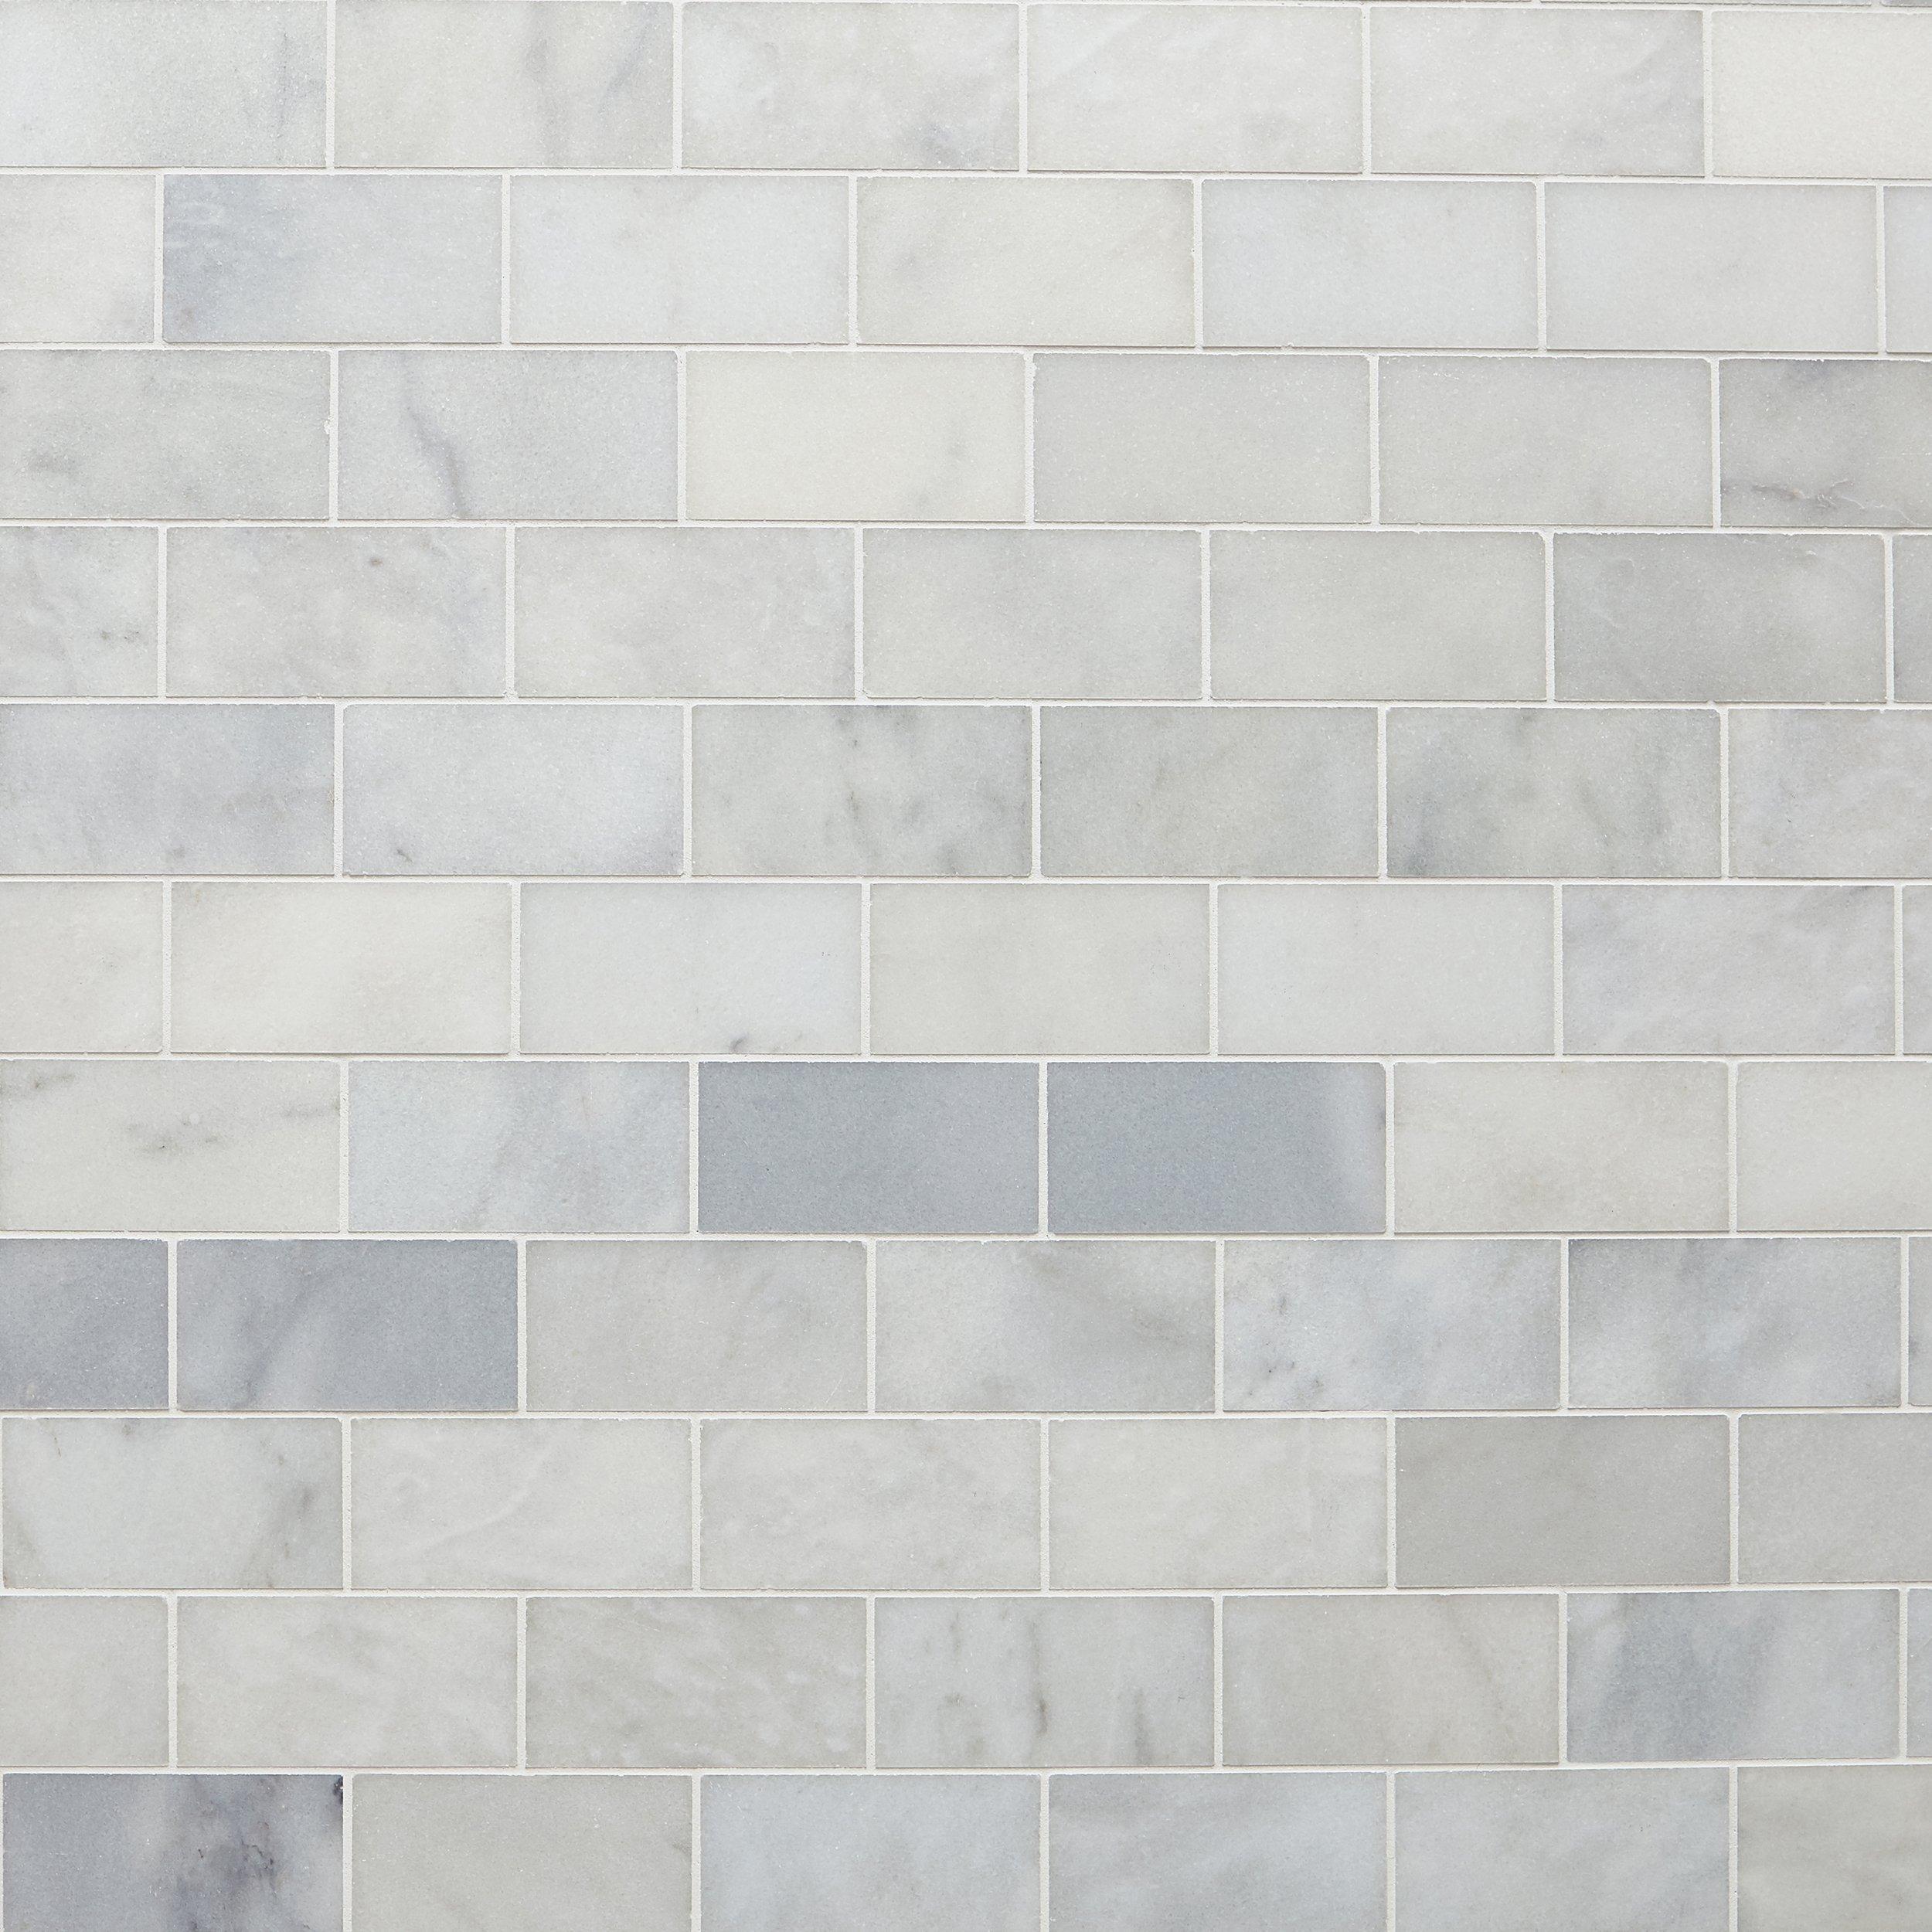 Carrara Chateau Honed Marble Tile 3 X 6 100701960 Floor And Decor